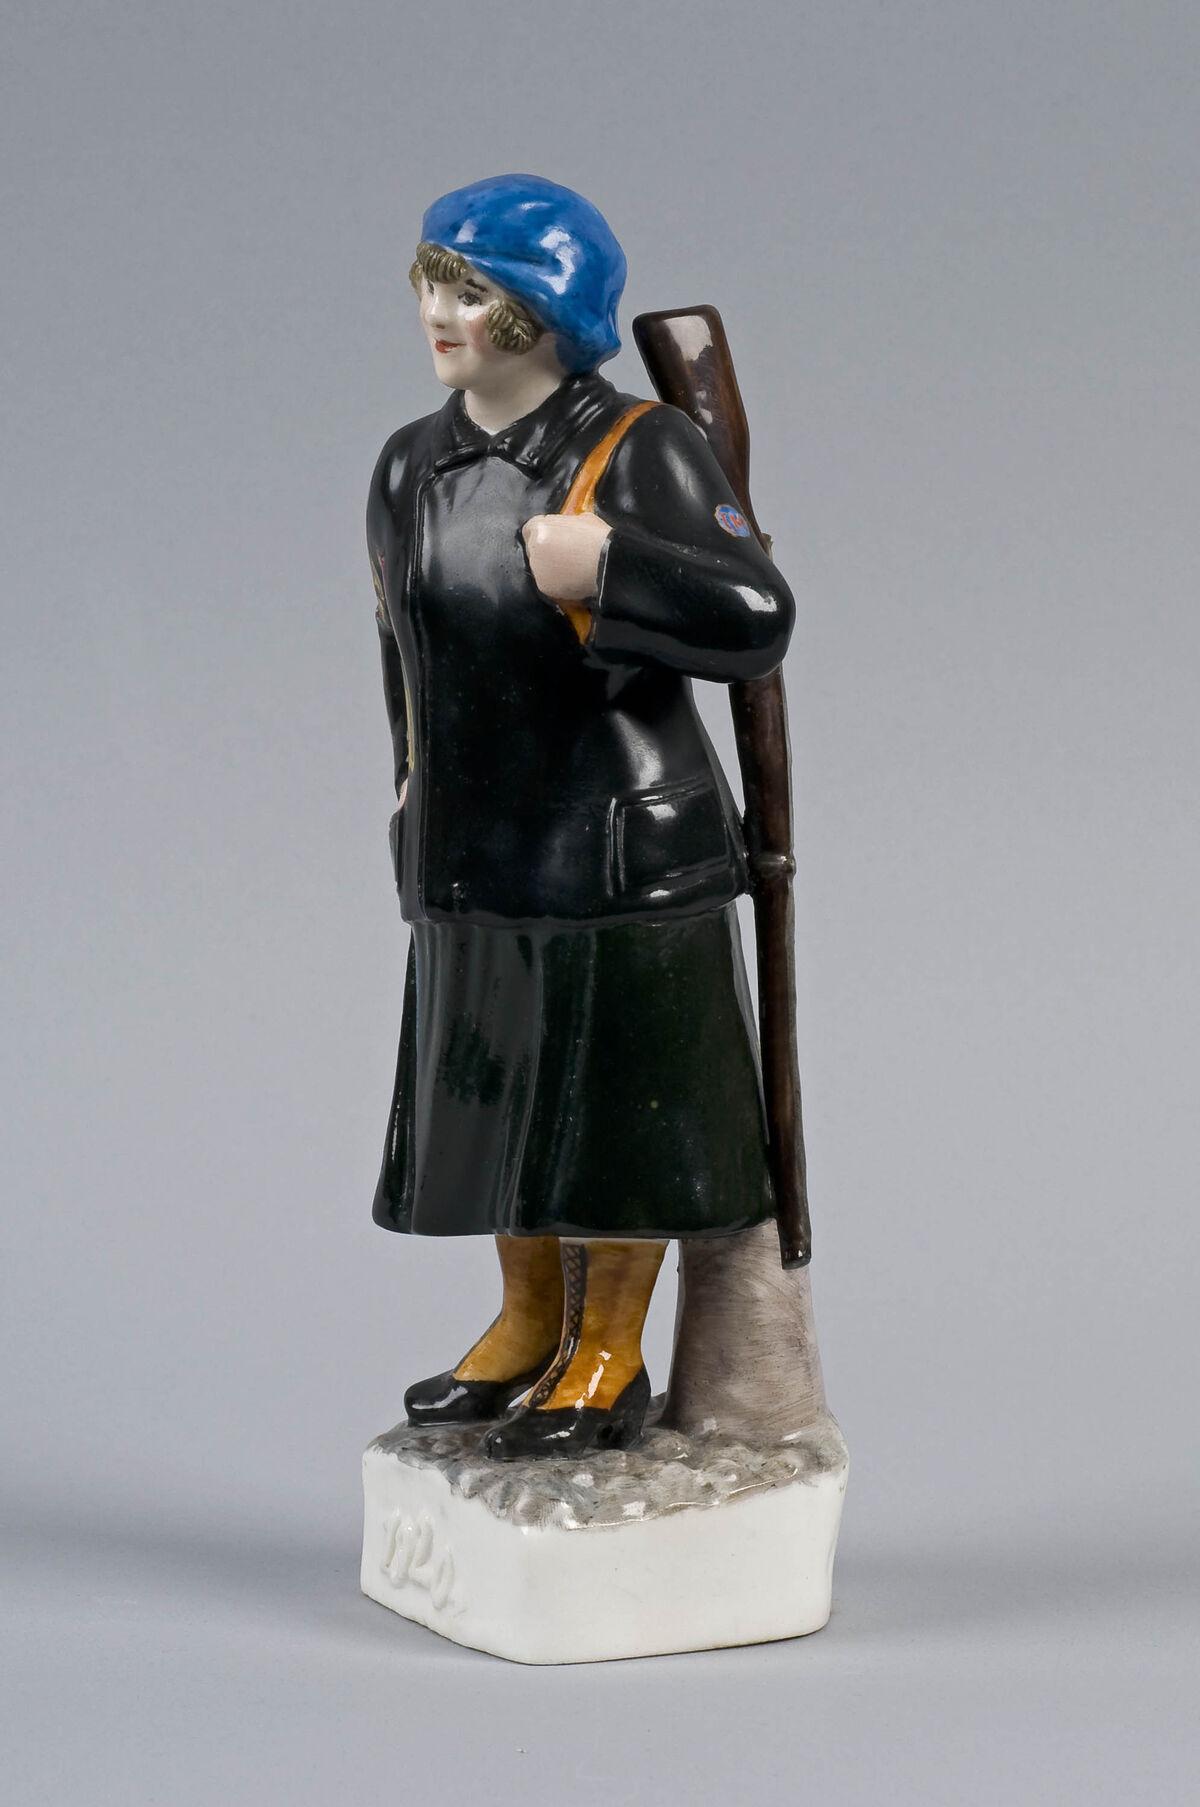 Natal'ia Dan'ko, Policewoman, 1920s. Collection of Vladimir Tsarenkiv. Courtesy of the Art Institute of Chicago.